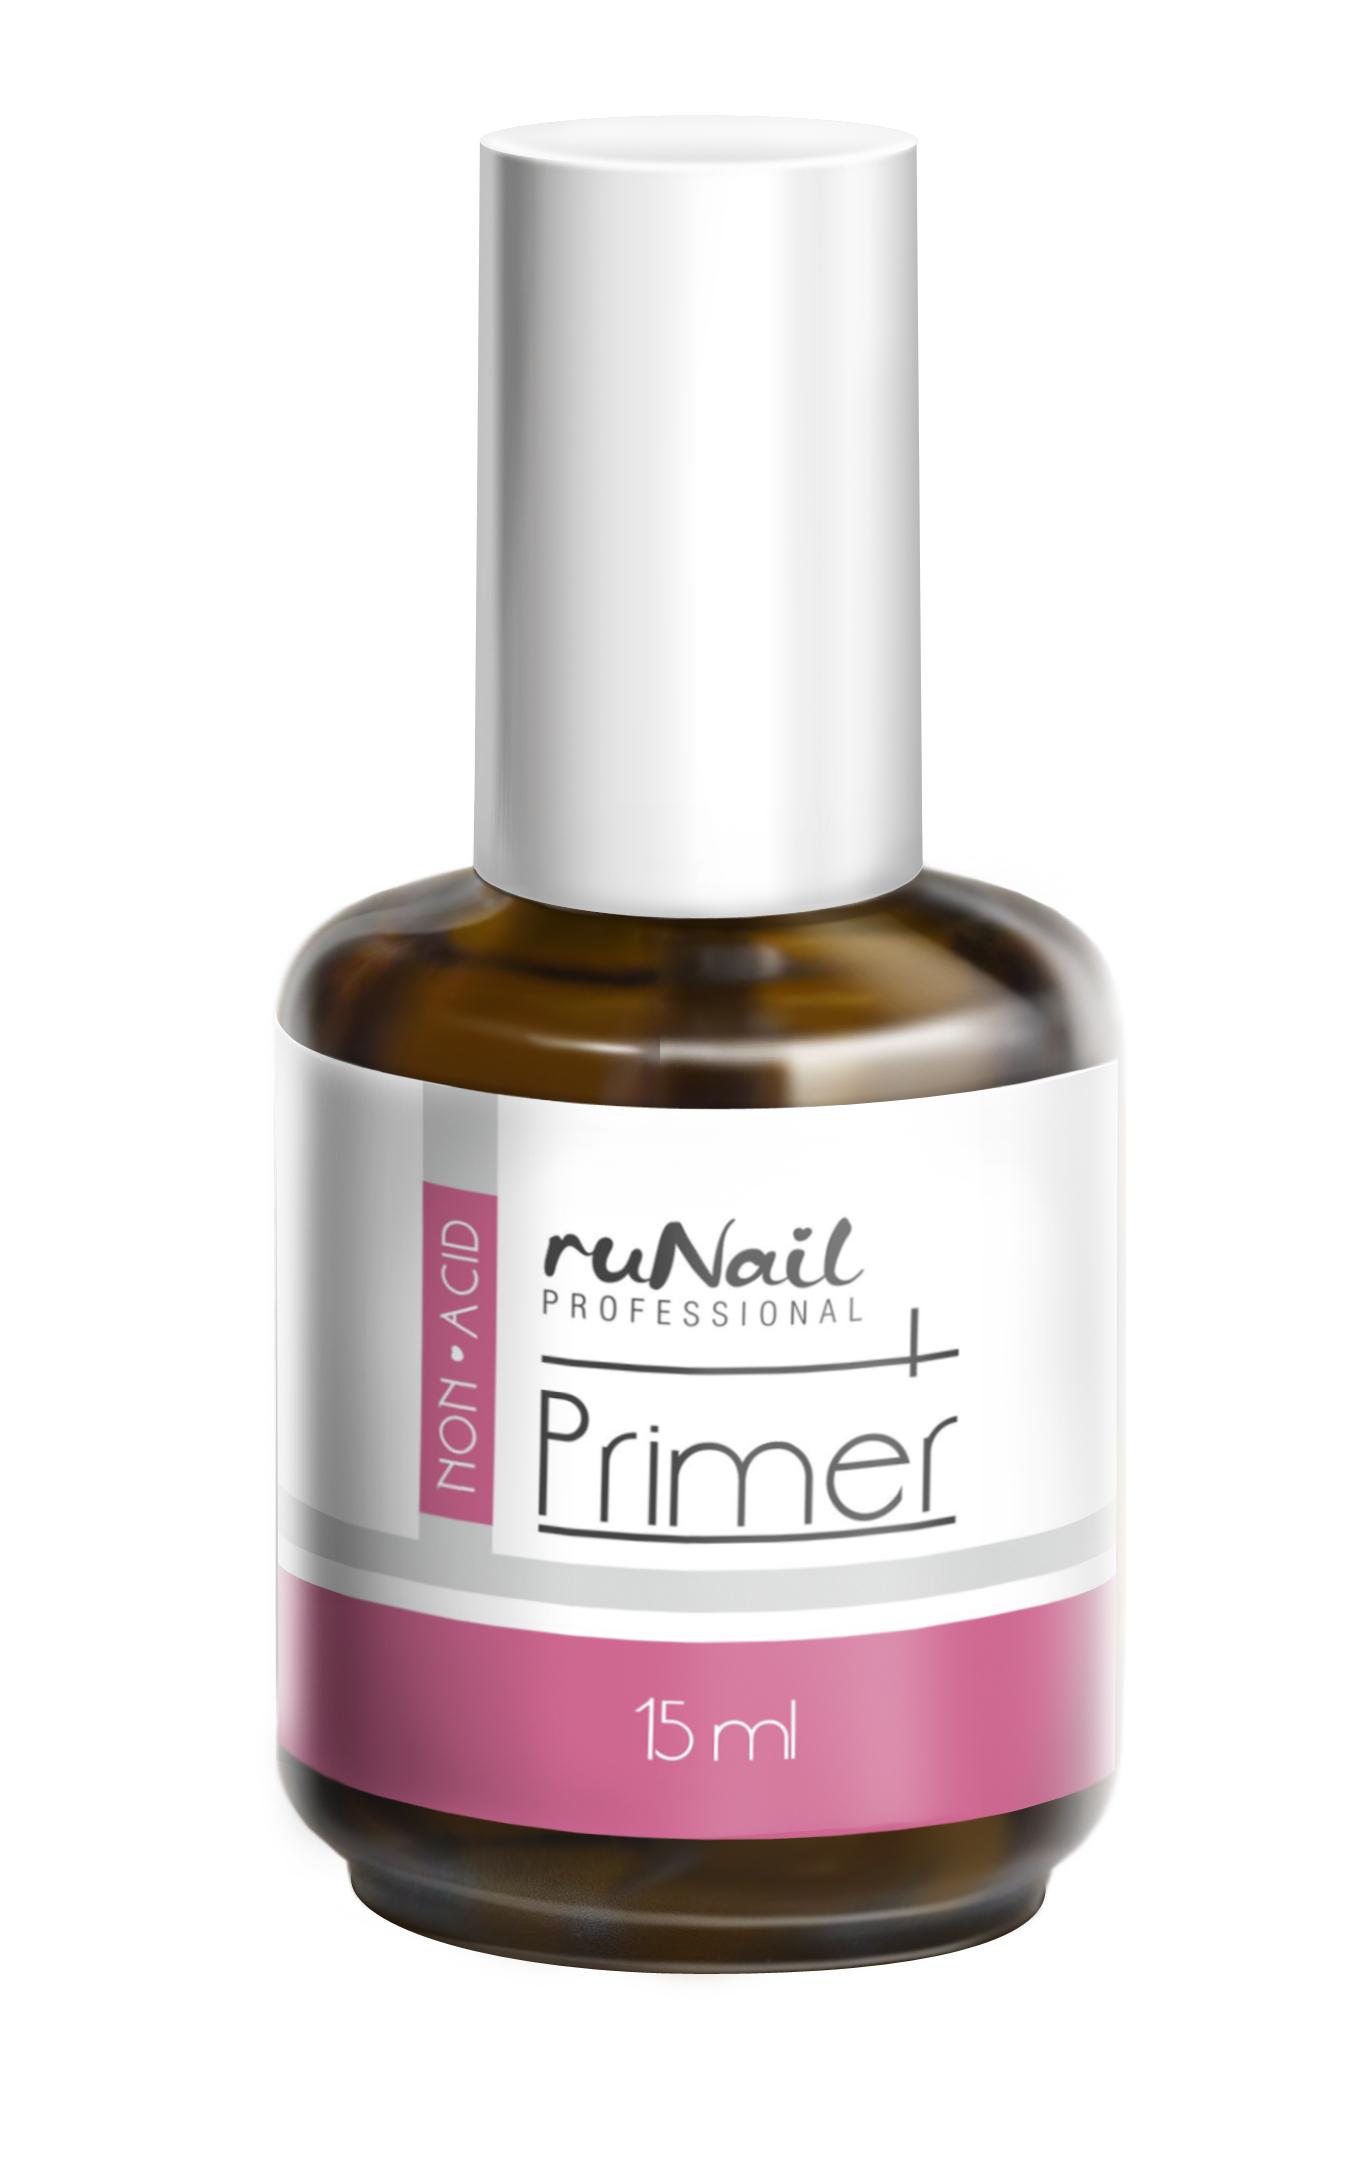 RuNail Праймер бескислотный 15 мл runail дизайн для ногтей ракушки 0284